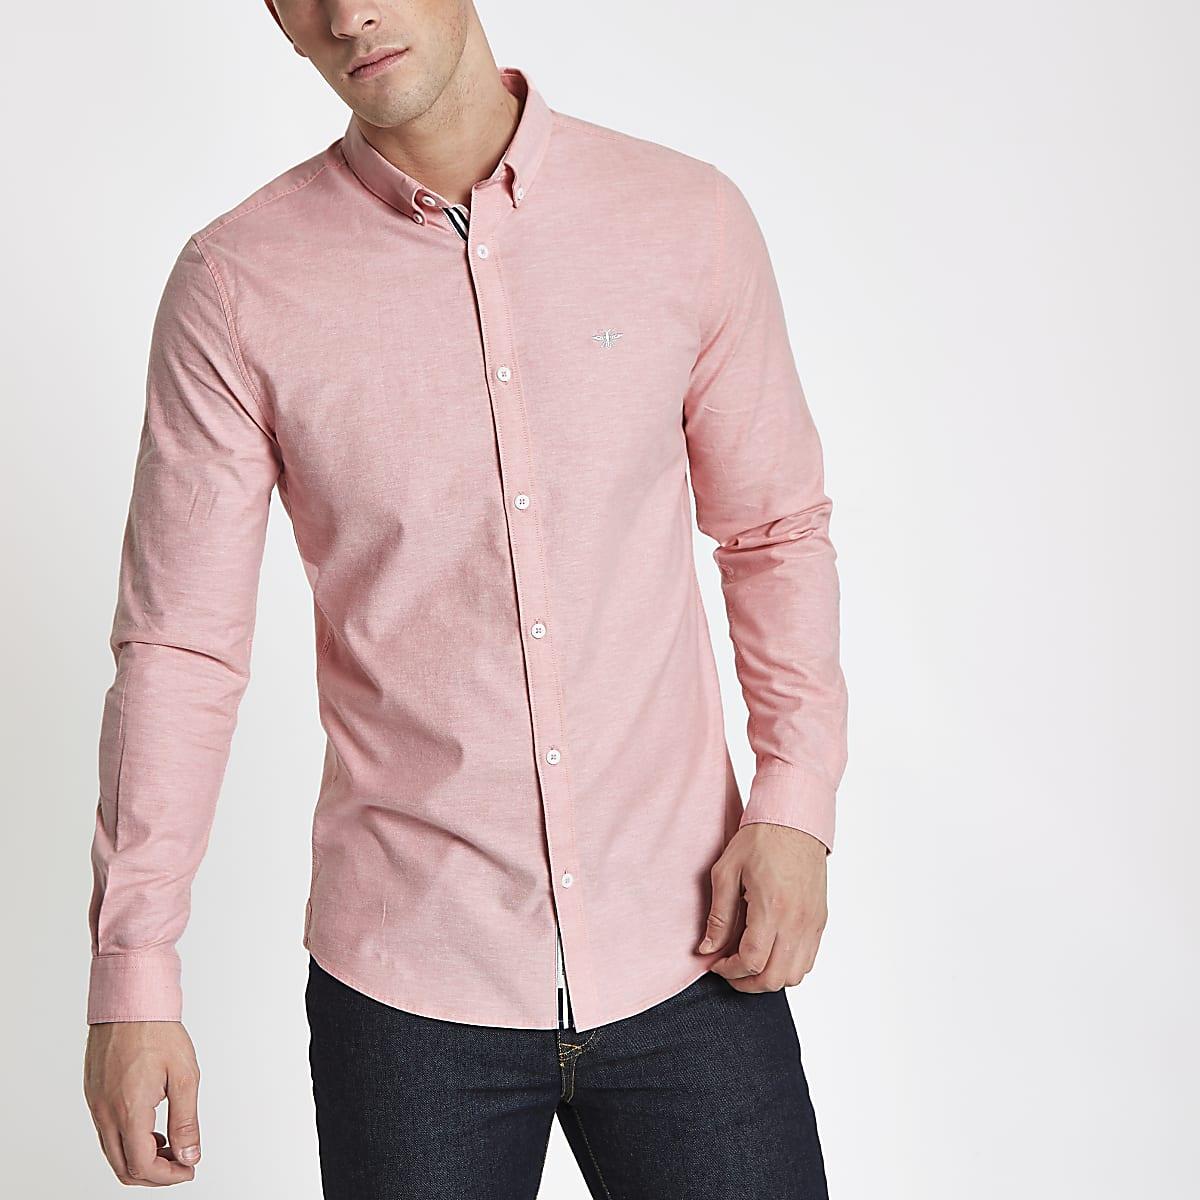 Chemise en oxford ajustée rose brodée